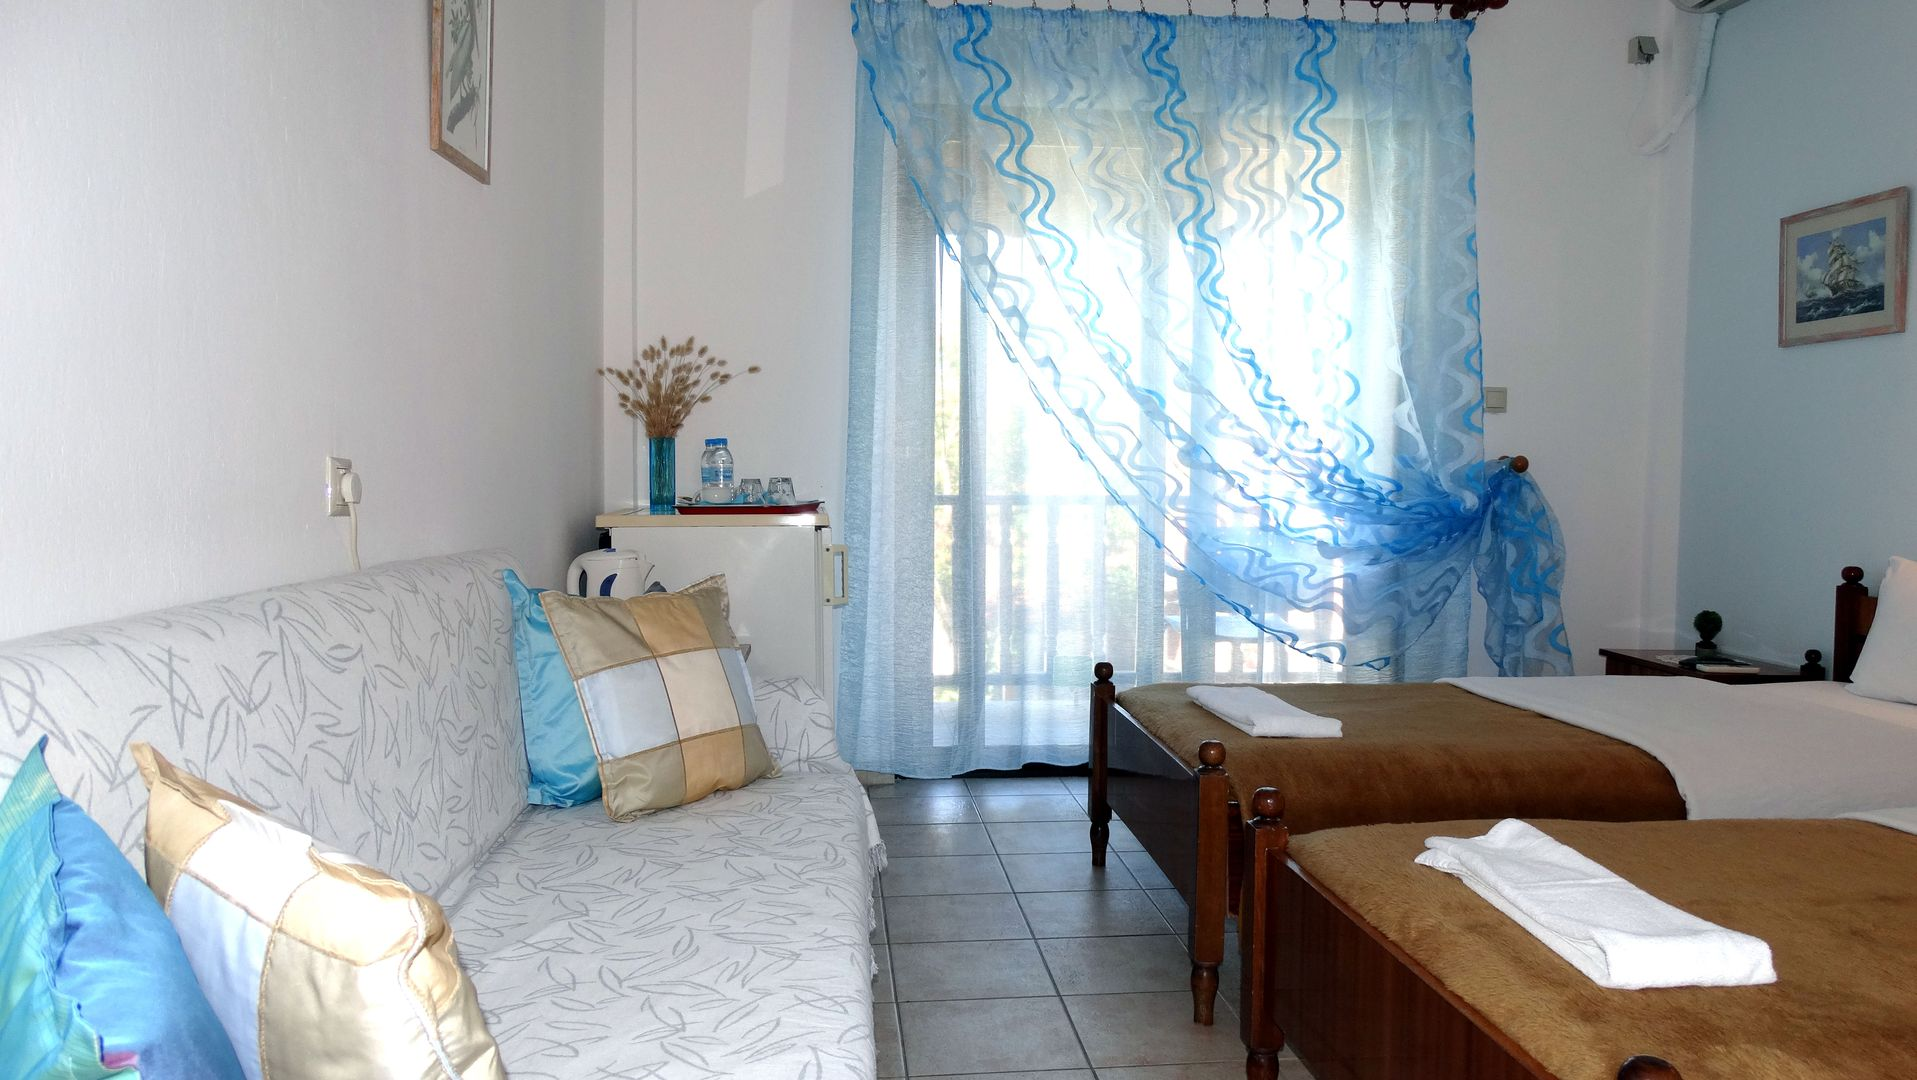 Guest house_ pansion_ athos_ ouranoupoli chalkidiki_mount athos-0054